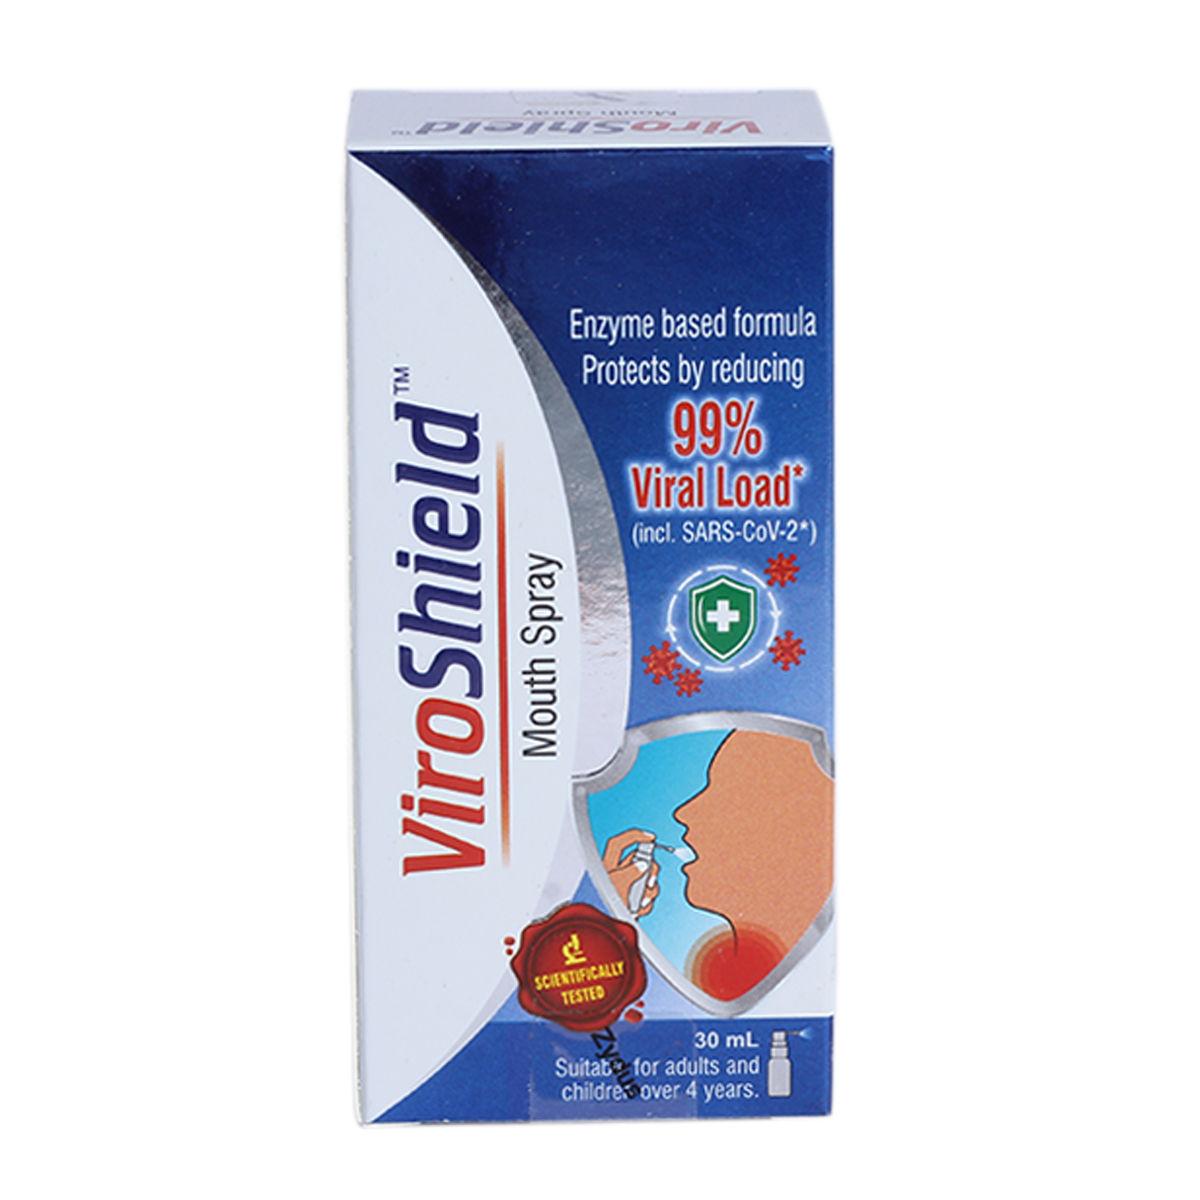 Viroshield Mouth Spray, 30 ml, Pack of 1